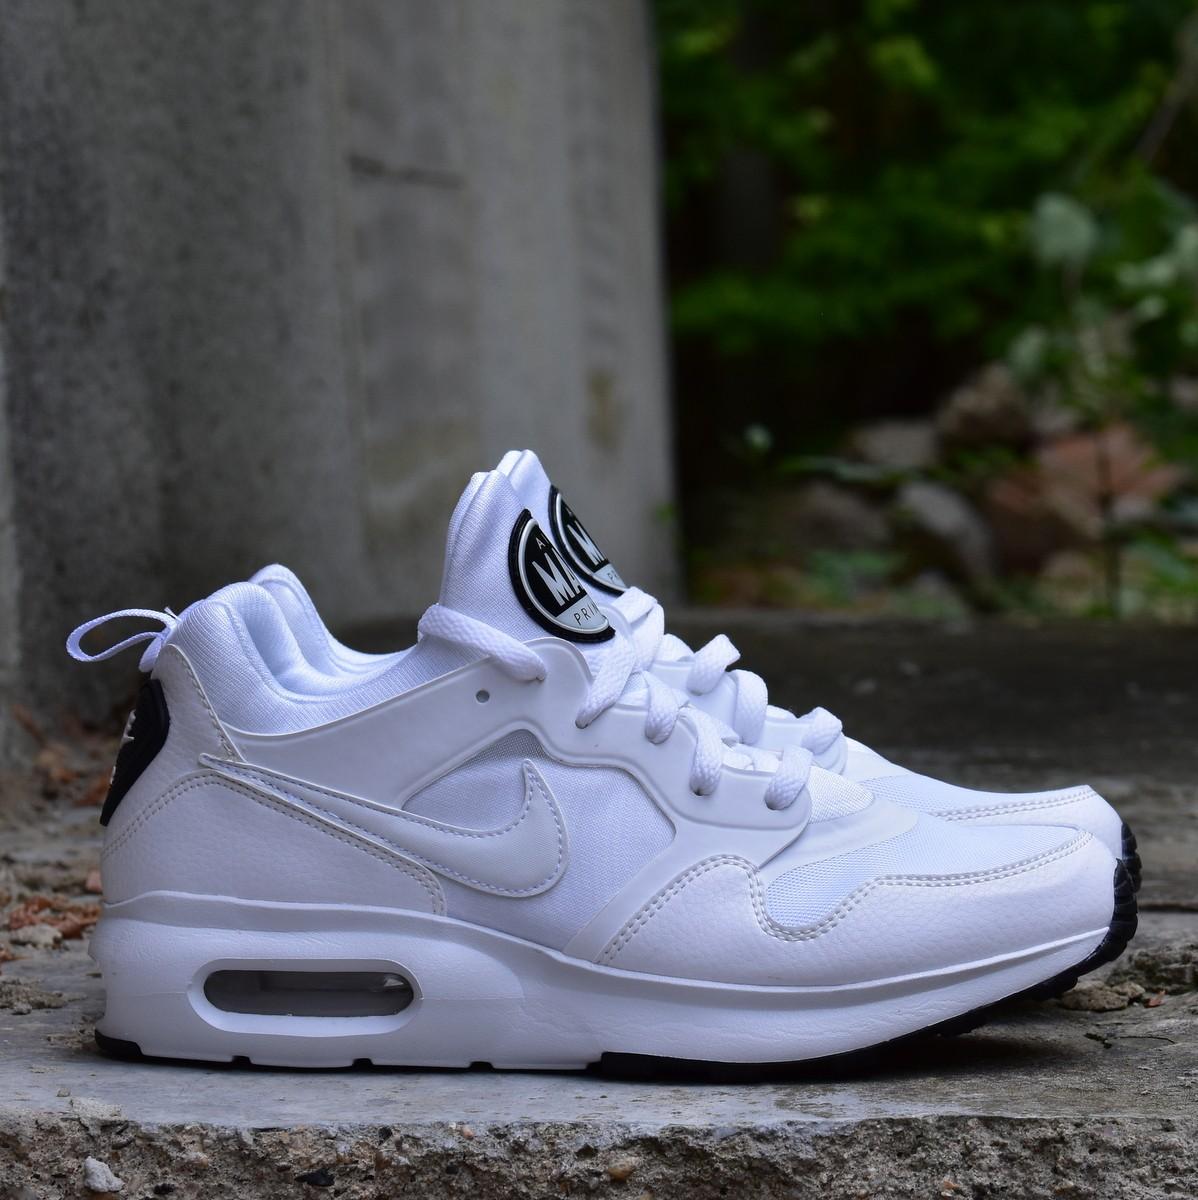 Nike AIR MAX PRIME Pánské boty EU 42.5 876068-100 b7243dad24f